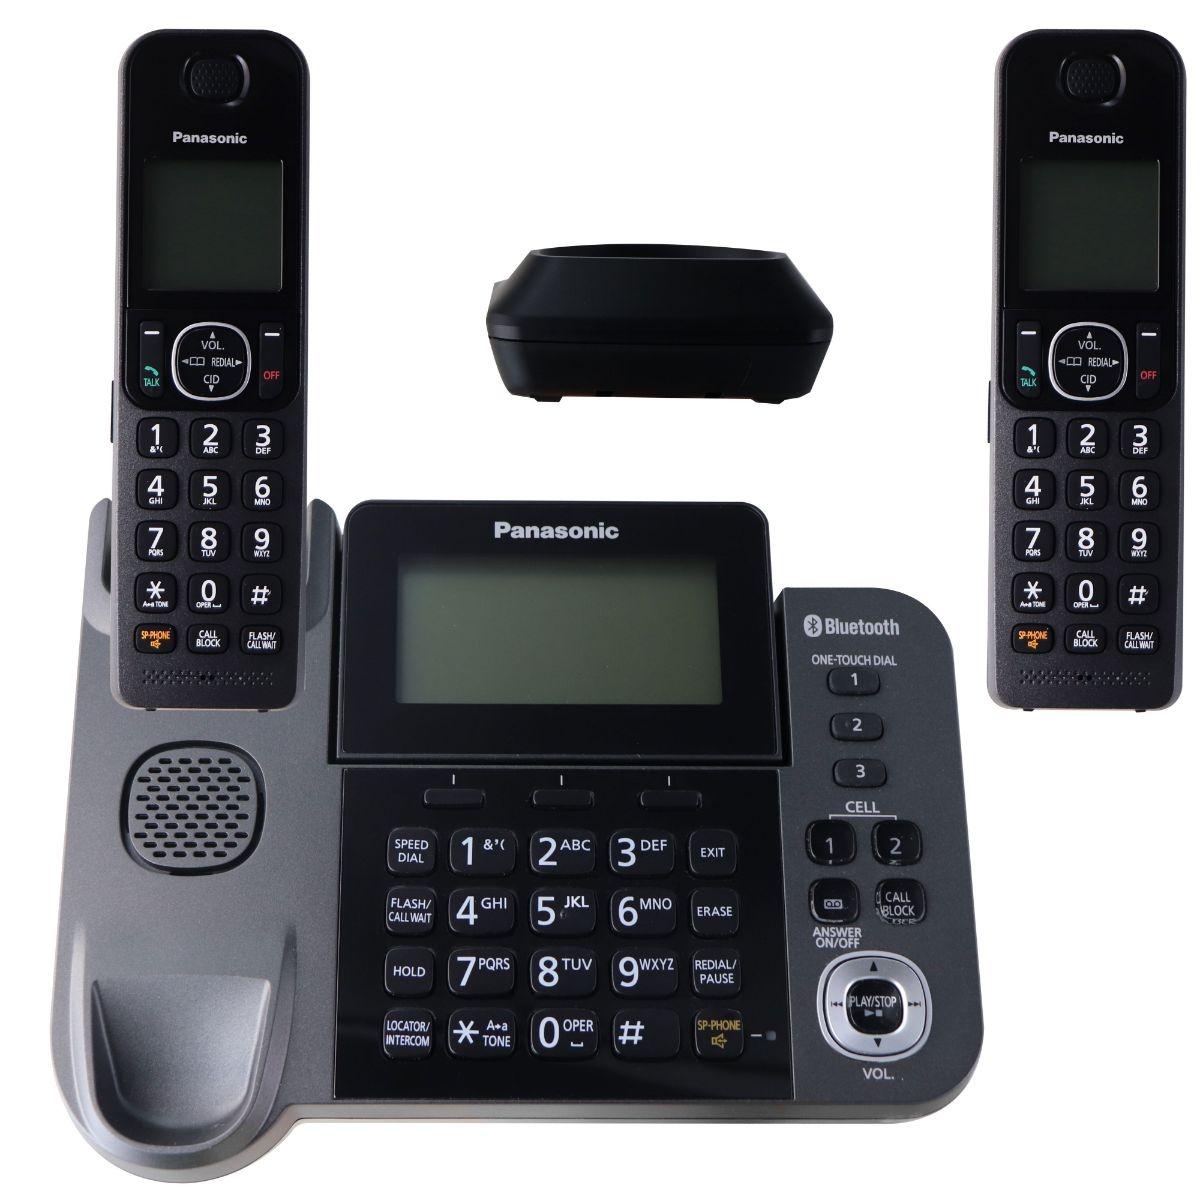 Panasonic KX-TGF382M DECT 2-Handset Landline Telephone - Black